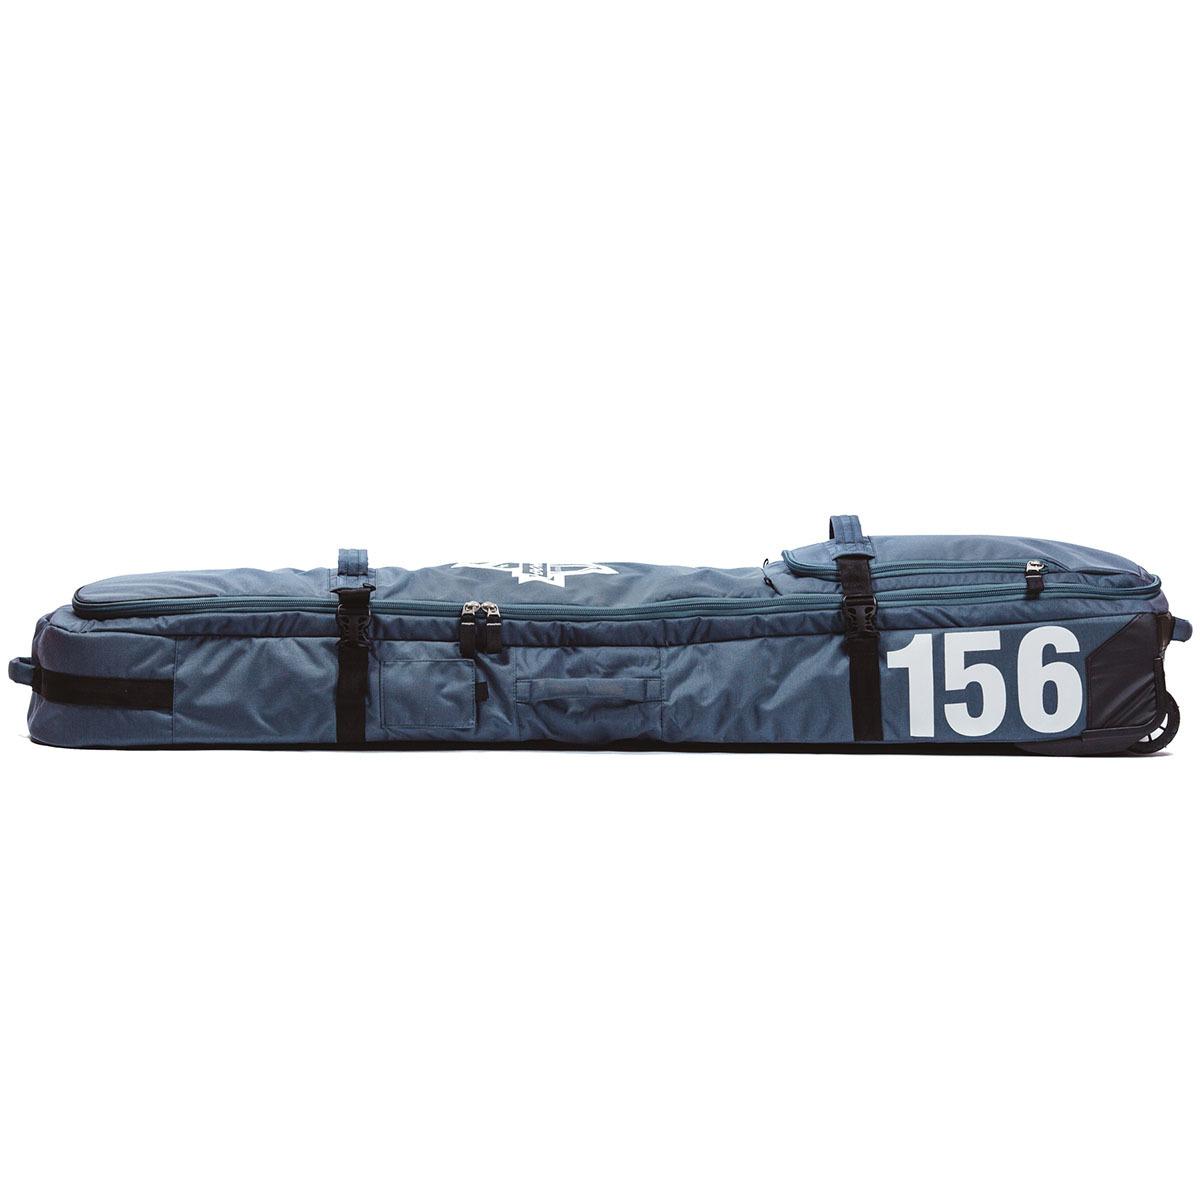 Чехол для сноуборда Born на колесах 156/166 см Серый (0099990)